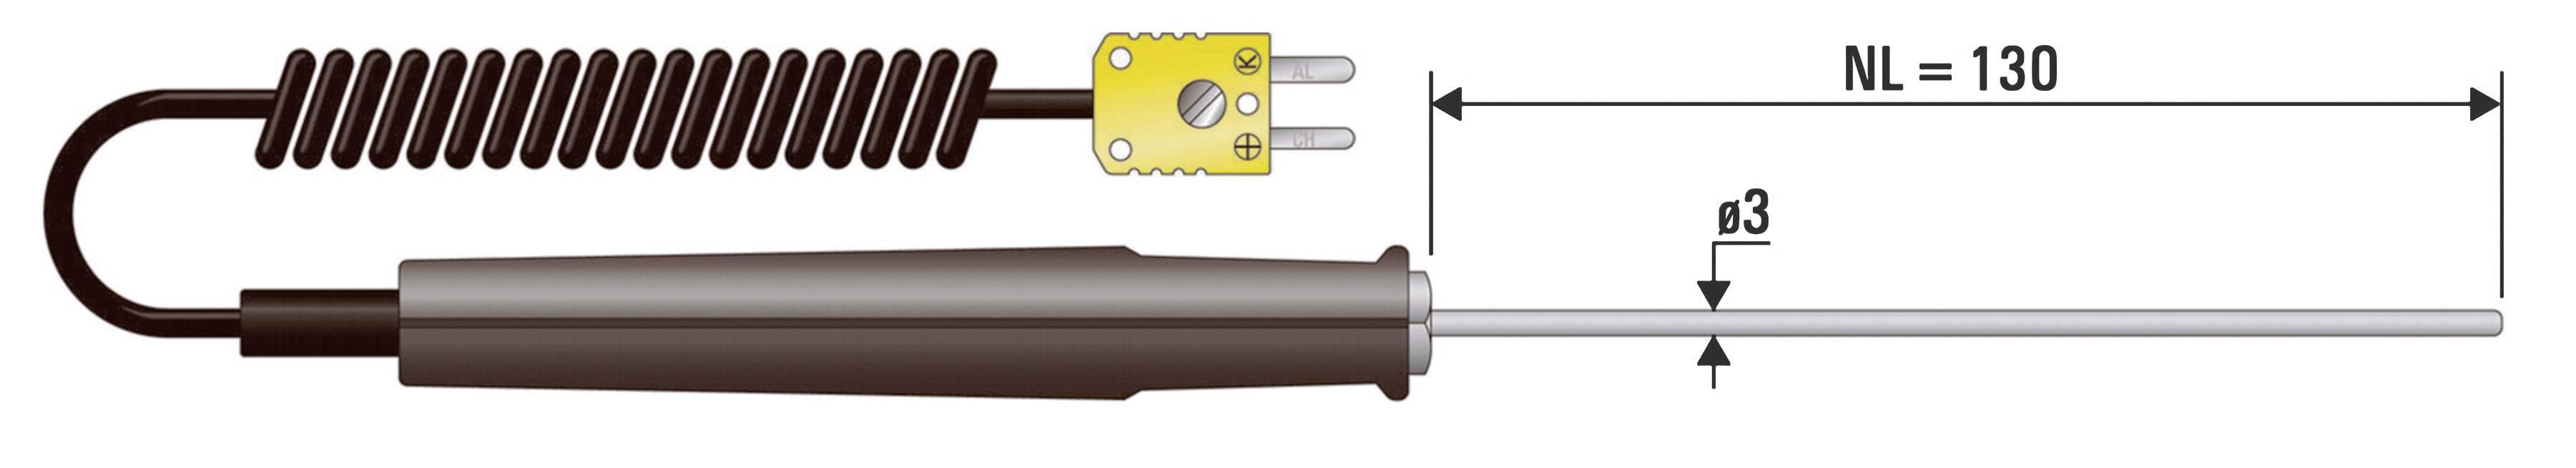 Teplotní čidlo B+B Thermo-technik, typ K (NiCrNi) B & B, -50 až 400 °C